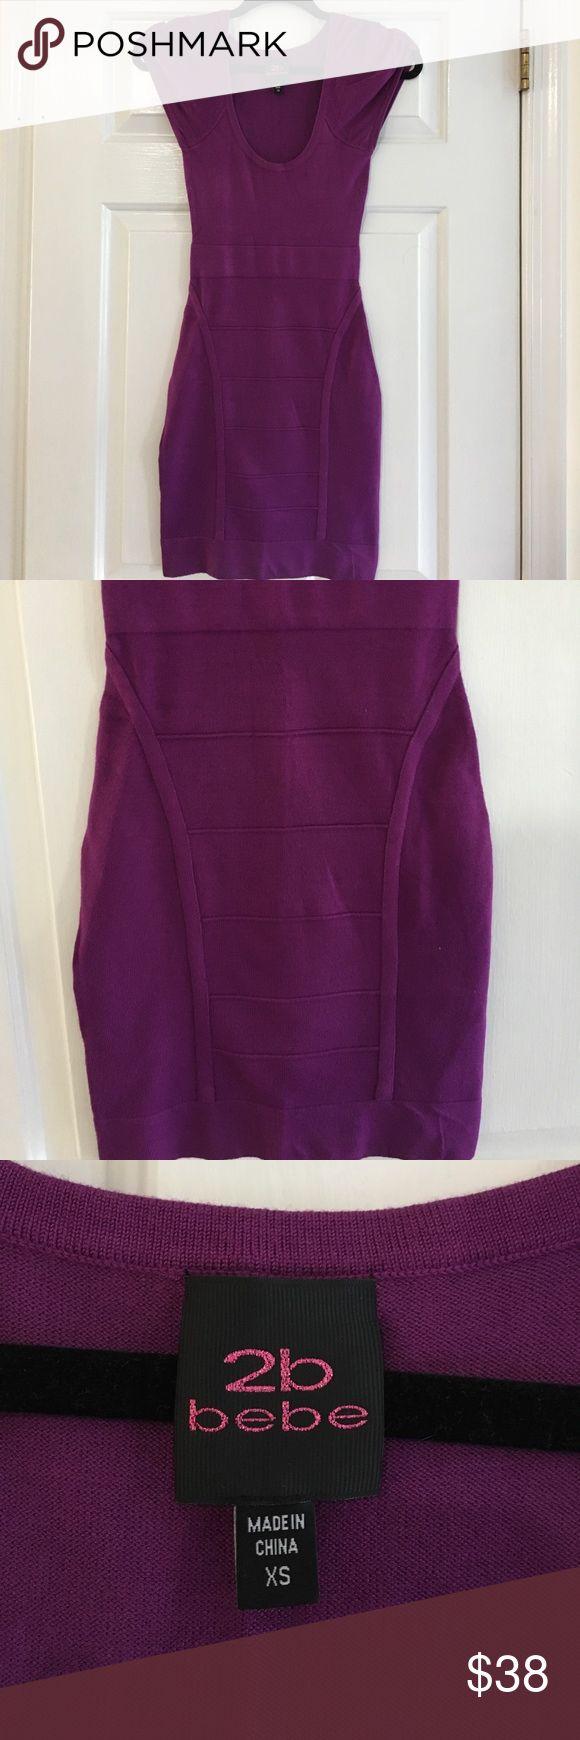 2B Bebe Purple mini dress Purple mini dress from 2B Bebe. Cap sleeve. Fun, sexy, girls night out dress! 💄 2B Bebe Dresses Mini